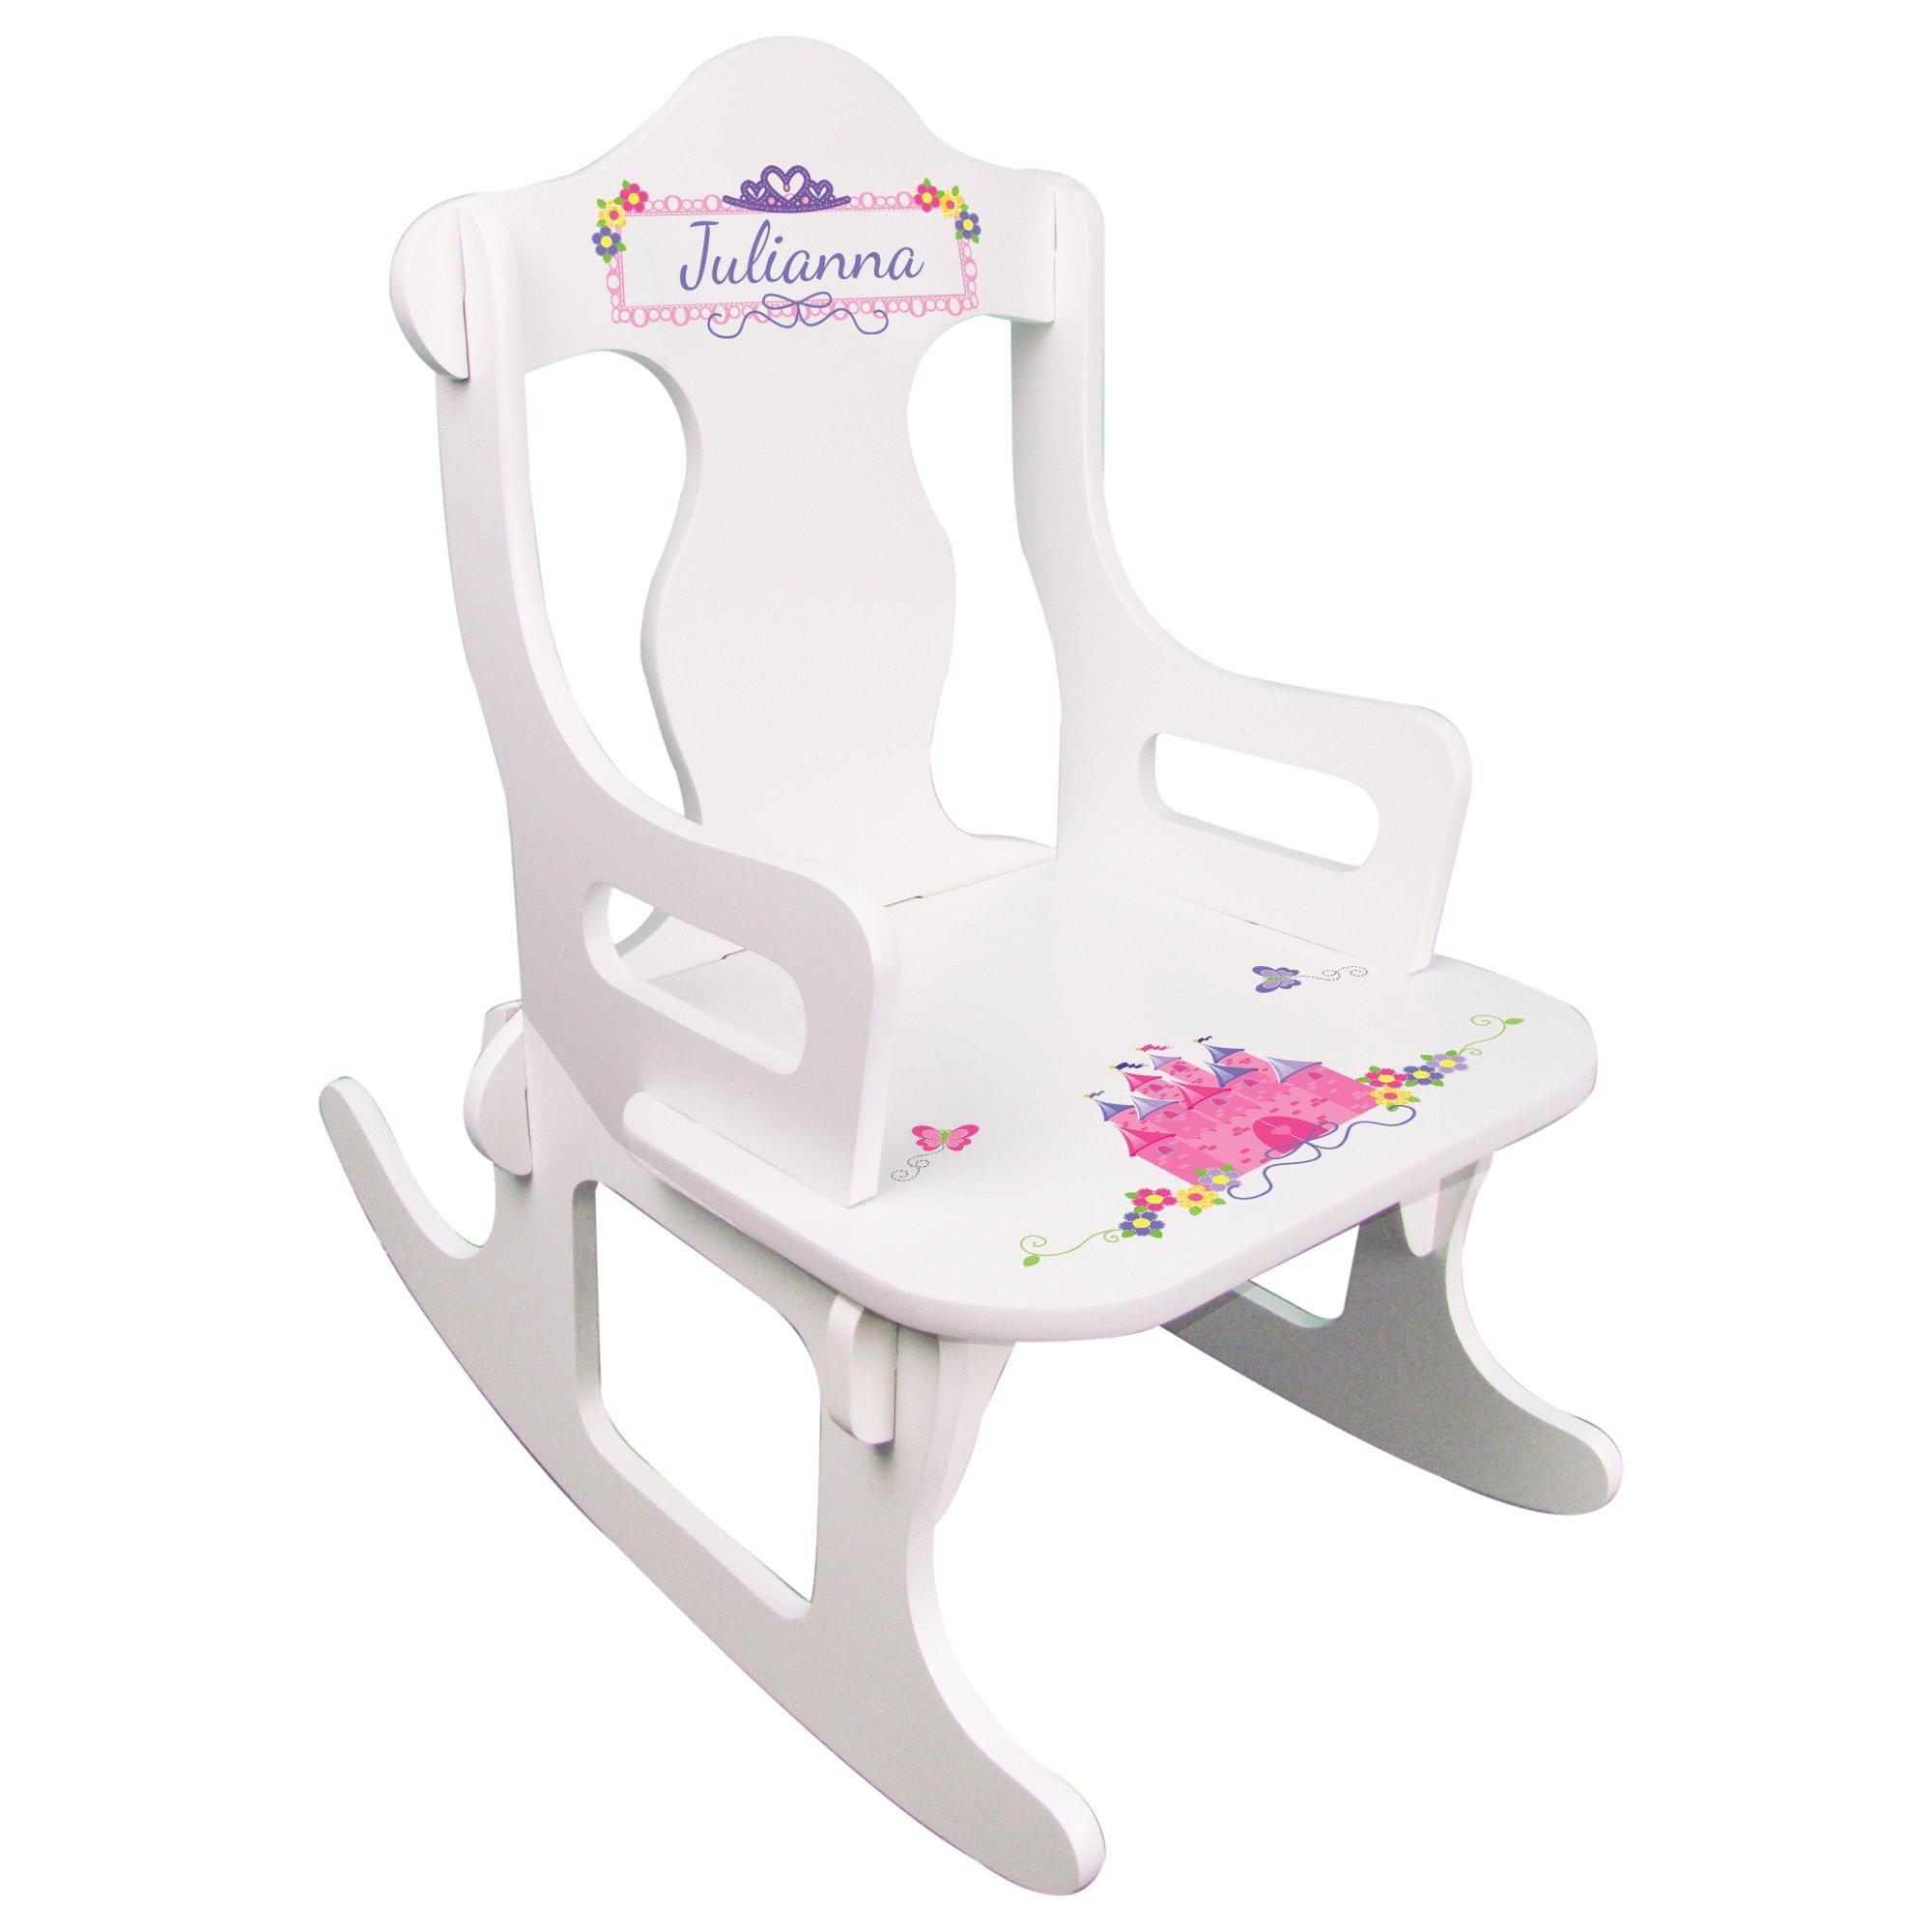 Personalized Child's Princess Puzzle Rocking Chair by MyBambino